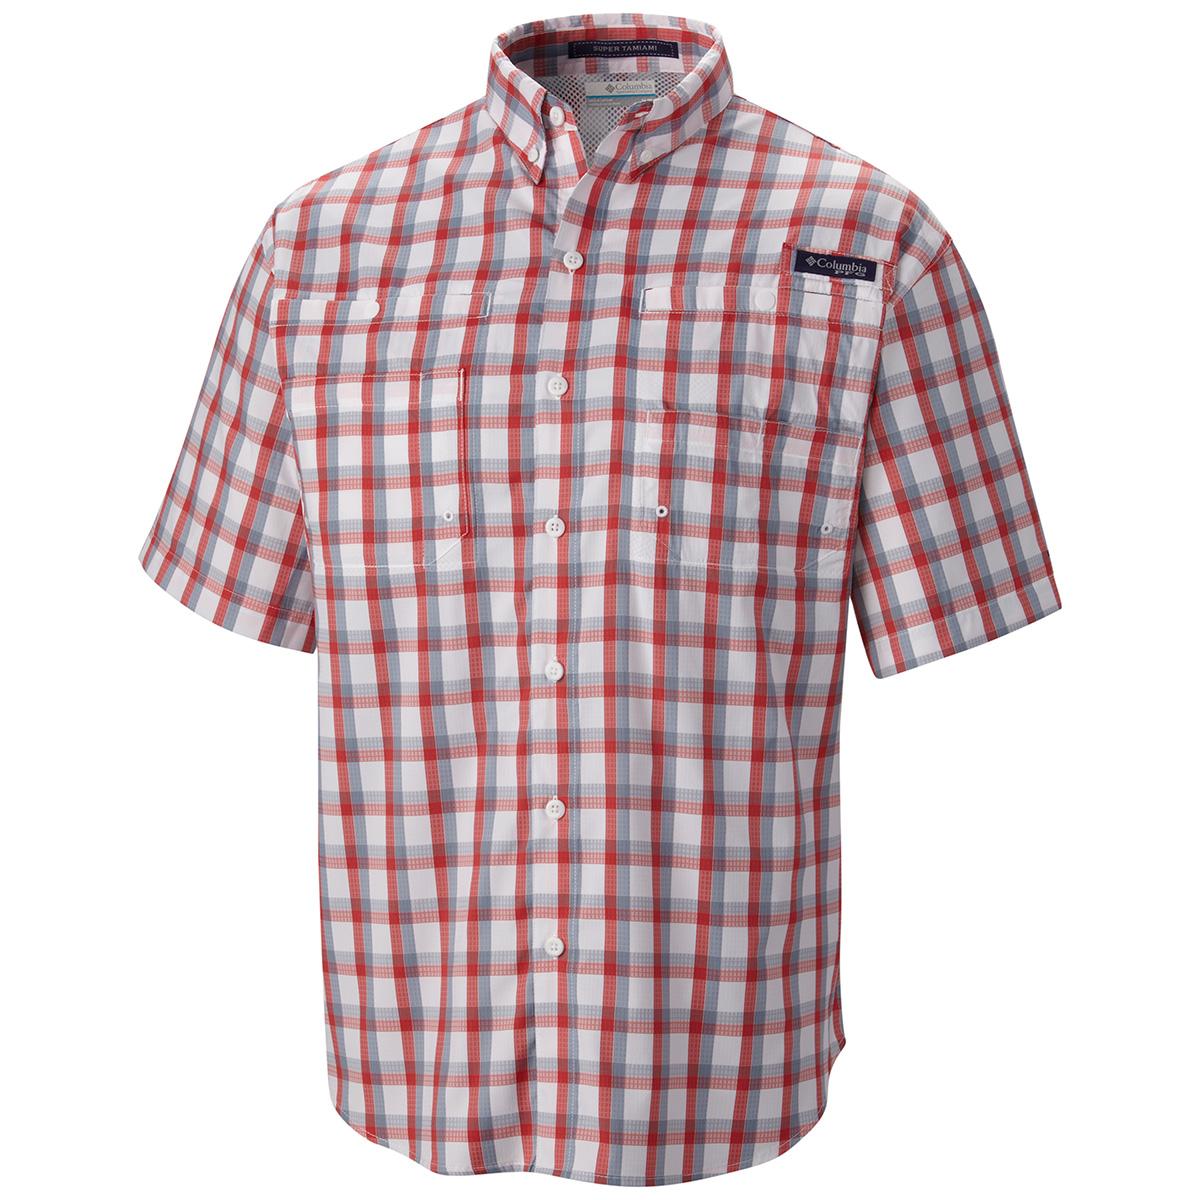 Columbia super tamiami ss shirt 2015 fishing shirts for Columbia cotton fishing shirt